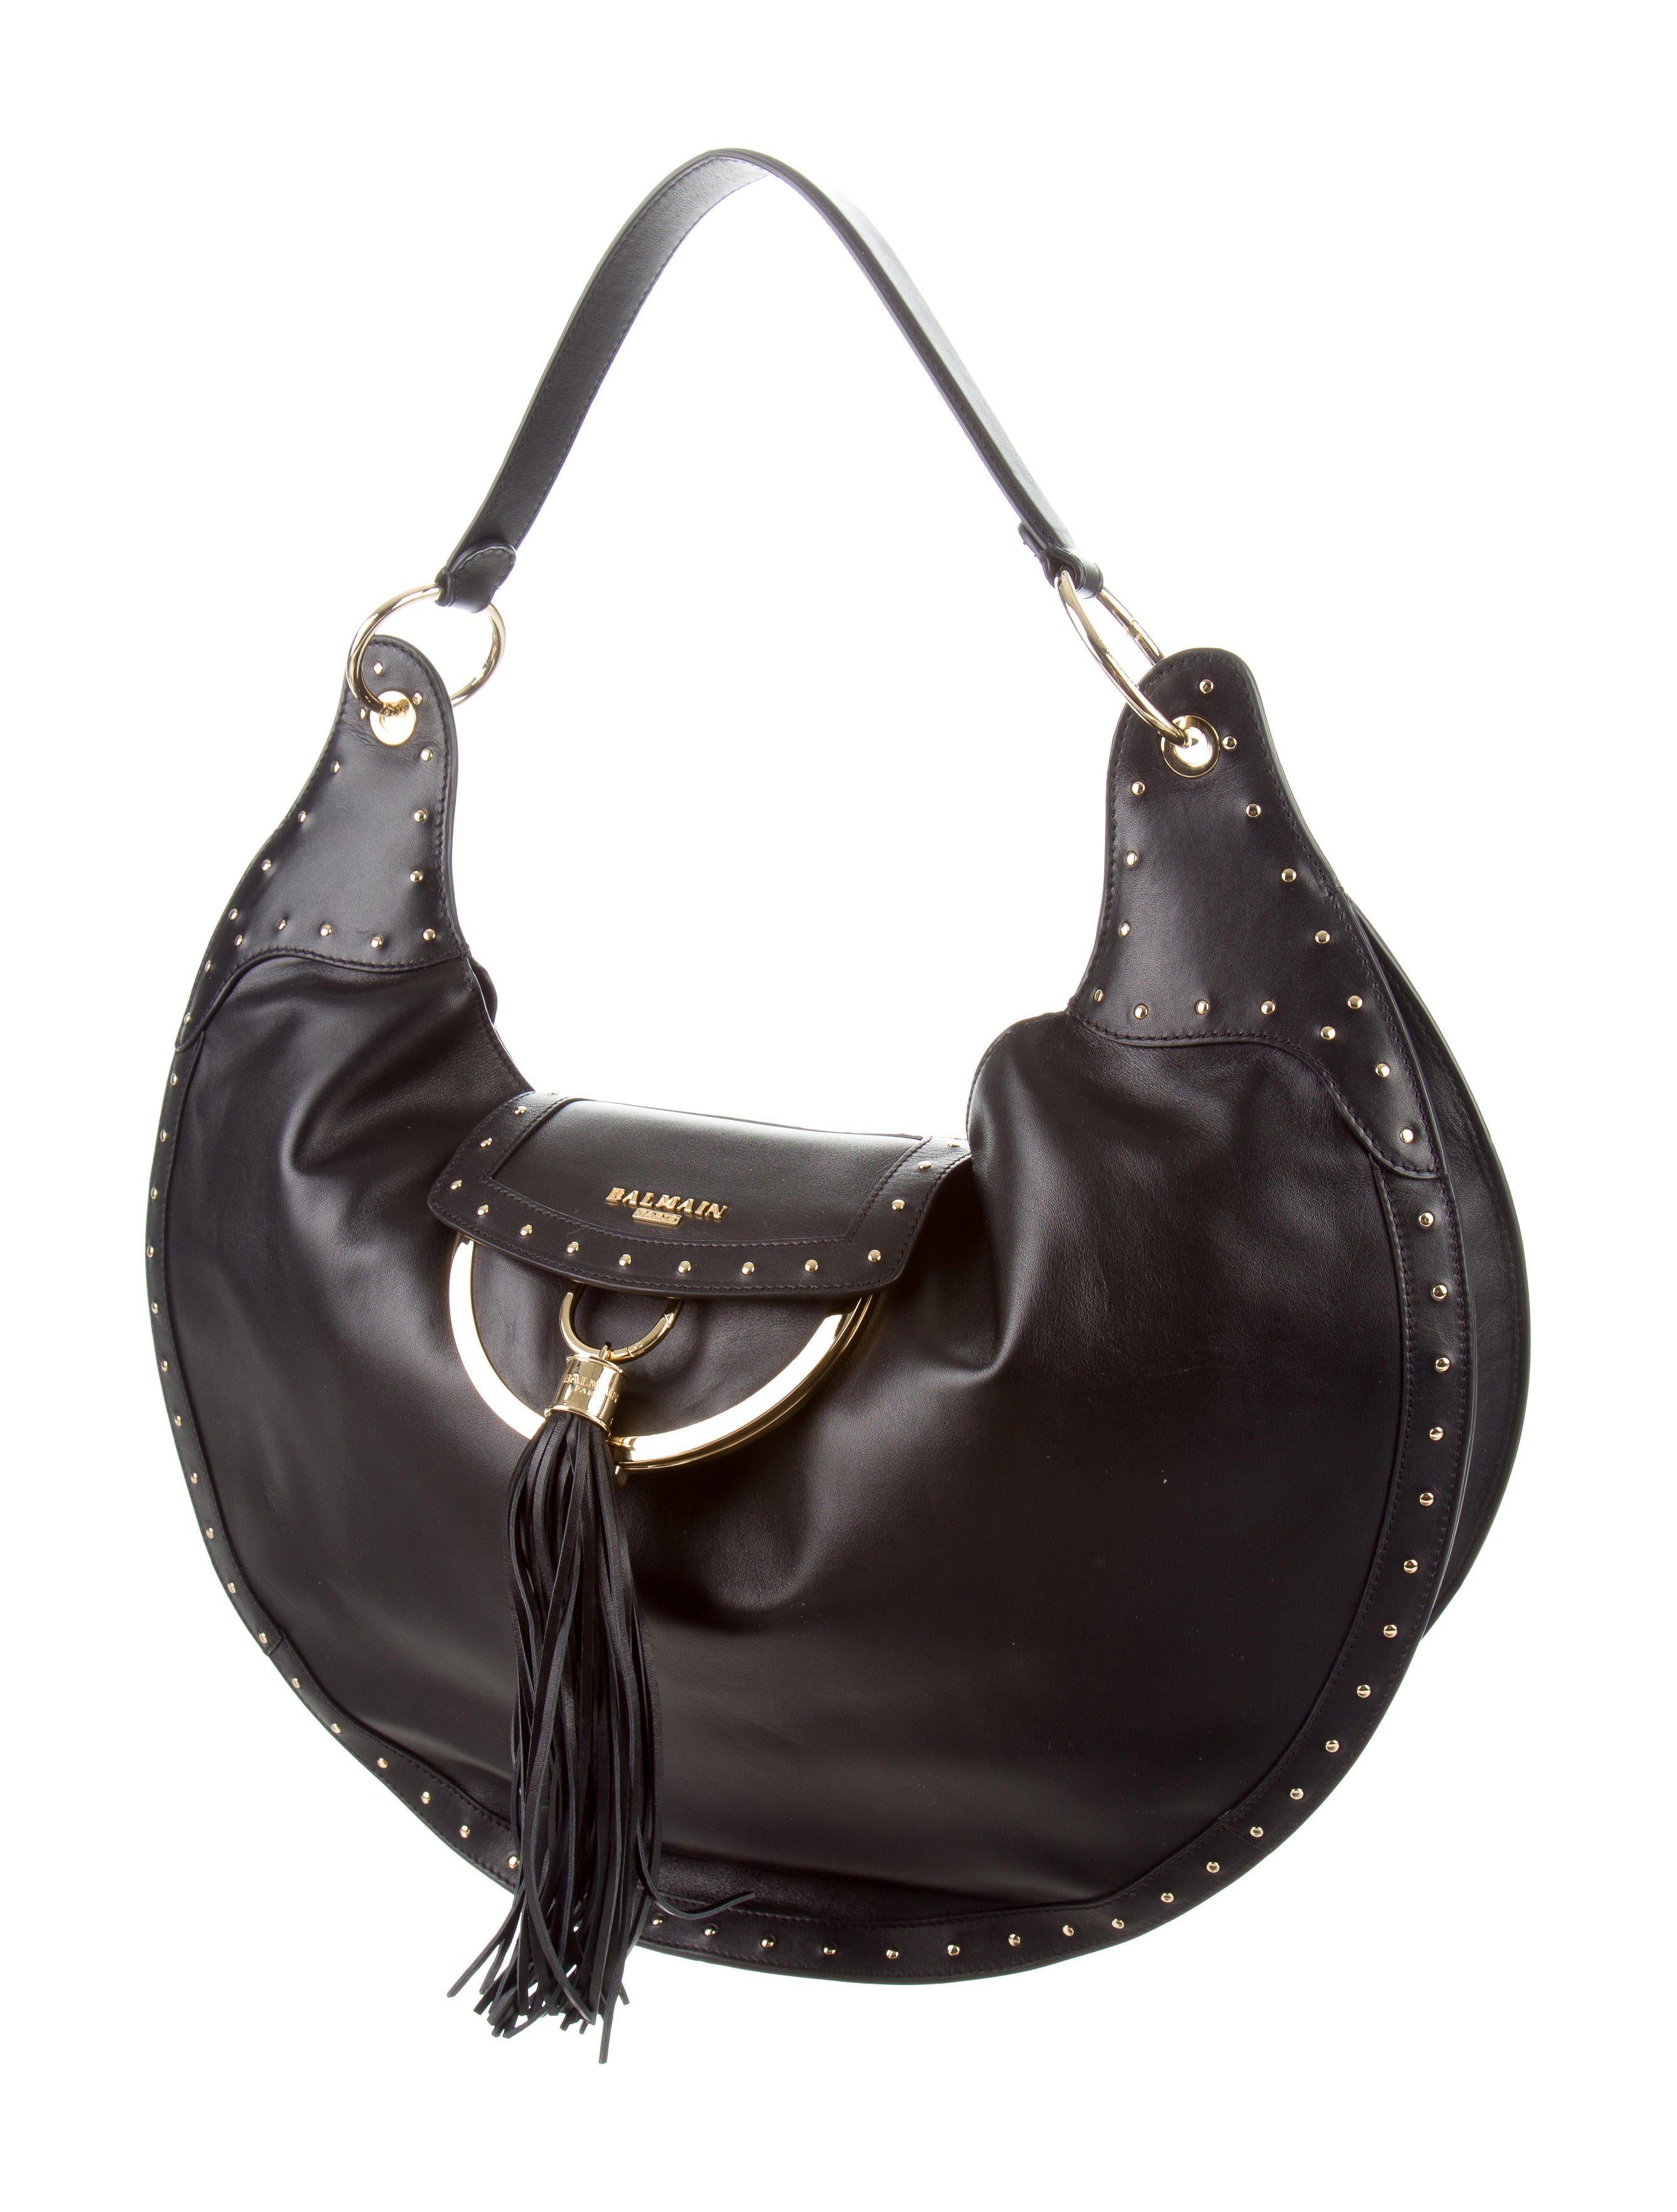 Free shipping and returns on Women's Balmain Handbags & Wallets at truedfil3gz.gq